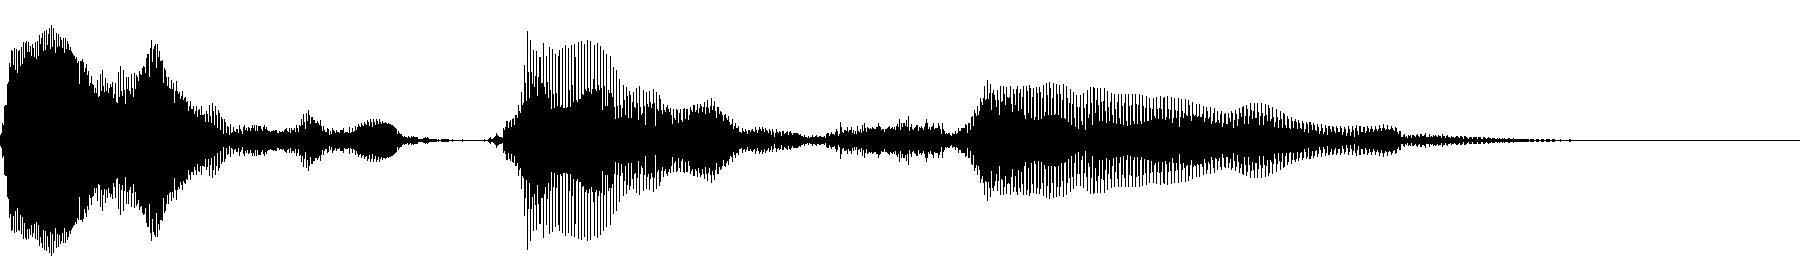 vesatile sound phrase pl